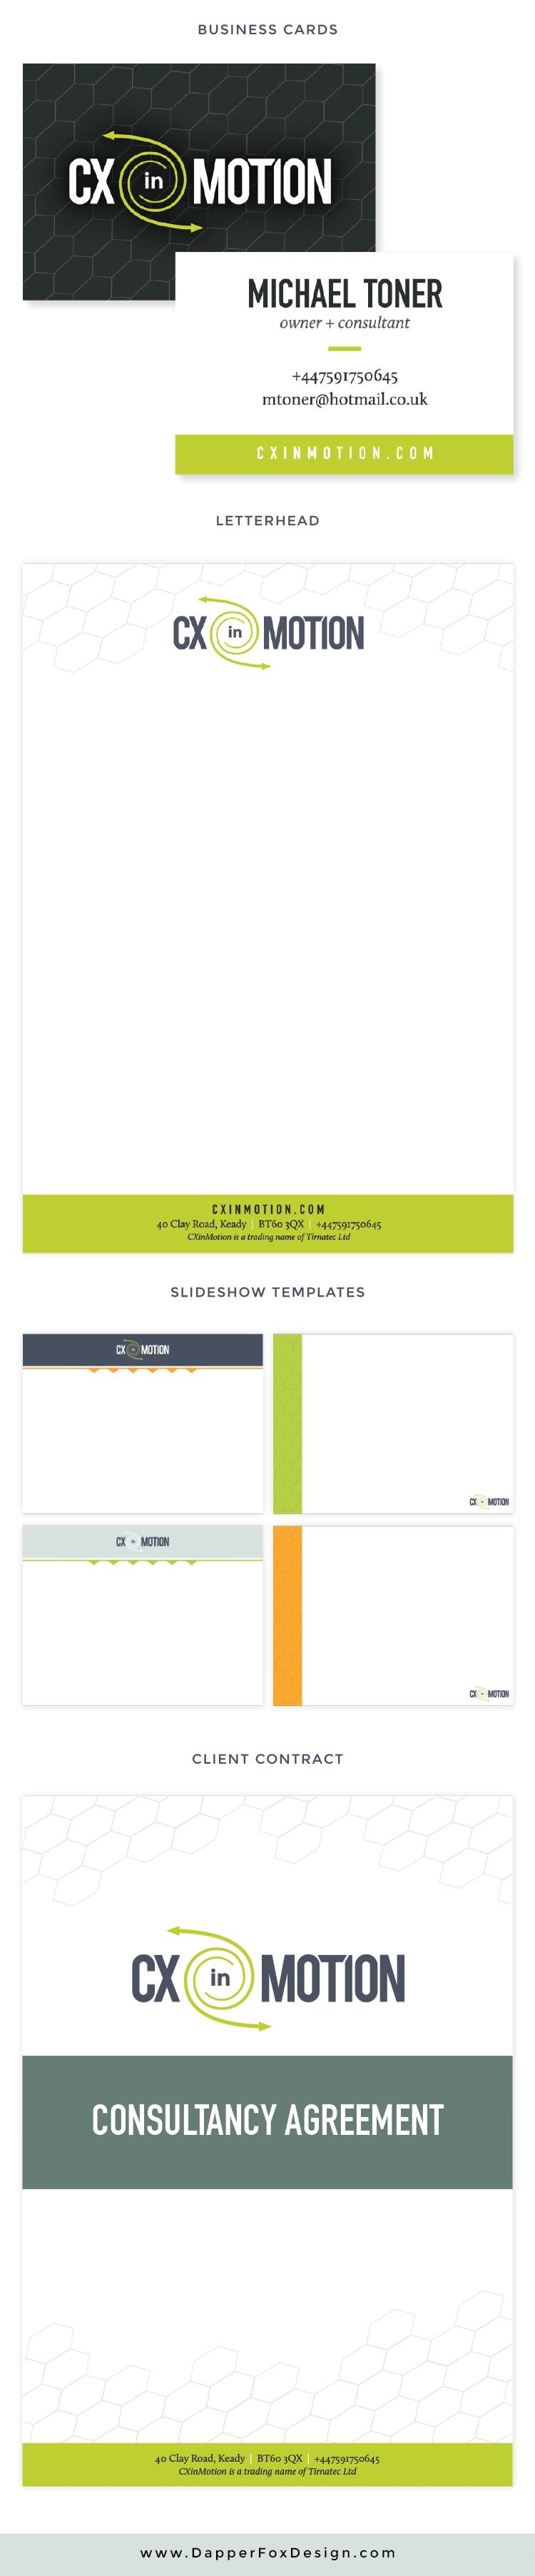 Modern Business Card Design, Letterhead, Business Slideshow Template, Business Contract for Consulting Group. Logo, Blog and Website Design by Dapper Fox in Park City, Utah.  #modernlogo  #corporatelogo    #consultantlogo  #cleanlogo  #logodesigninspiration  #logodesign    #branding